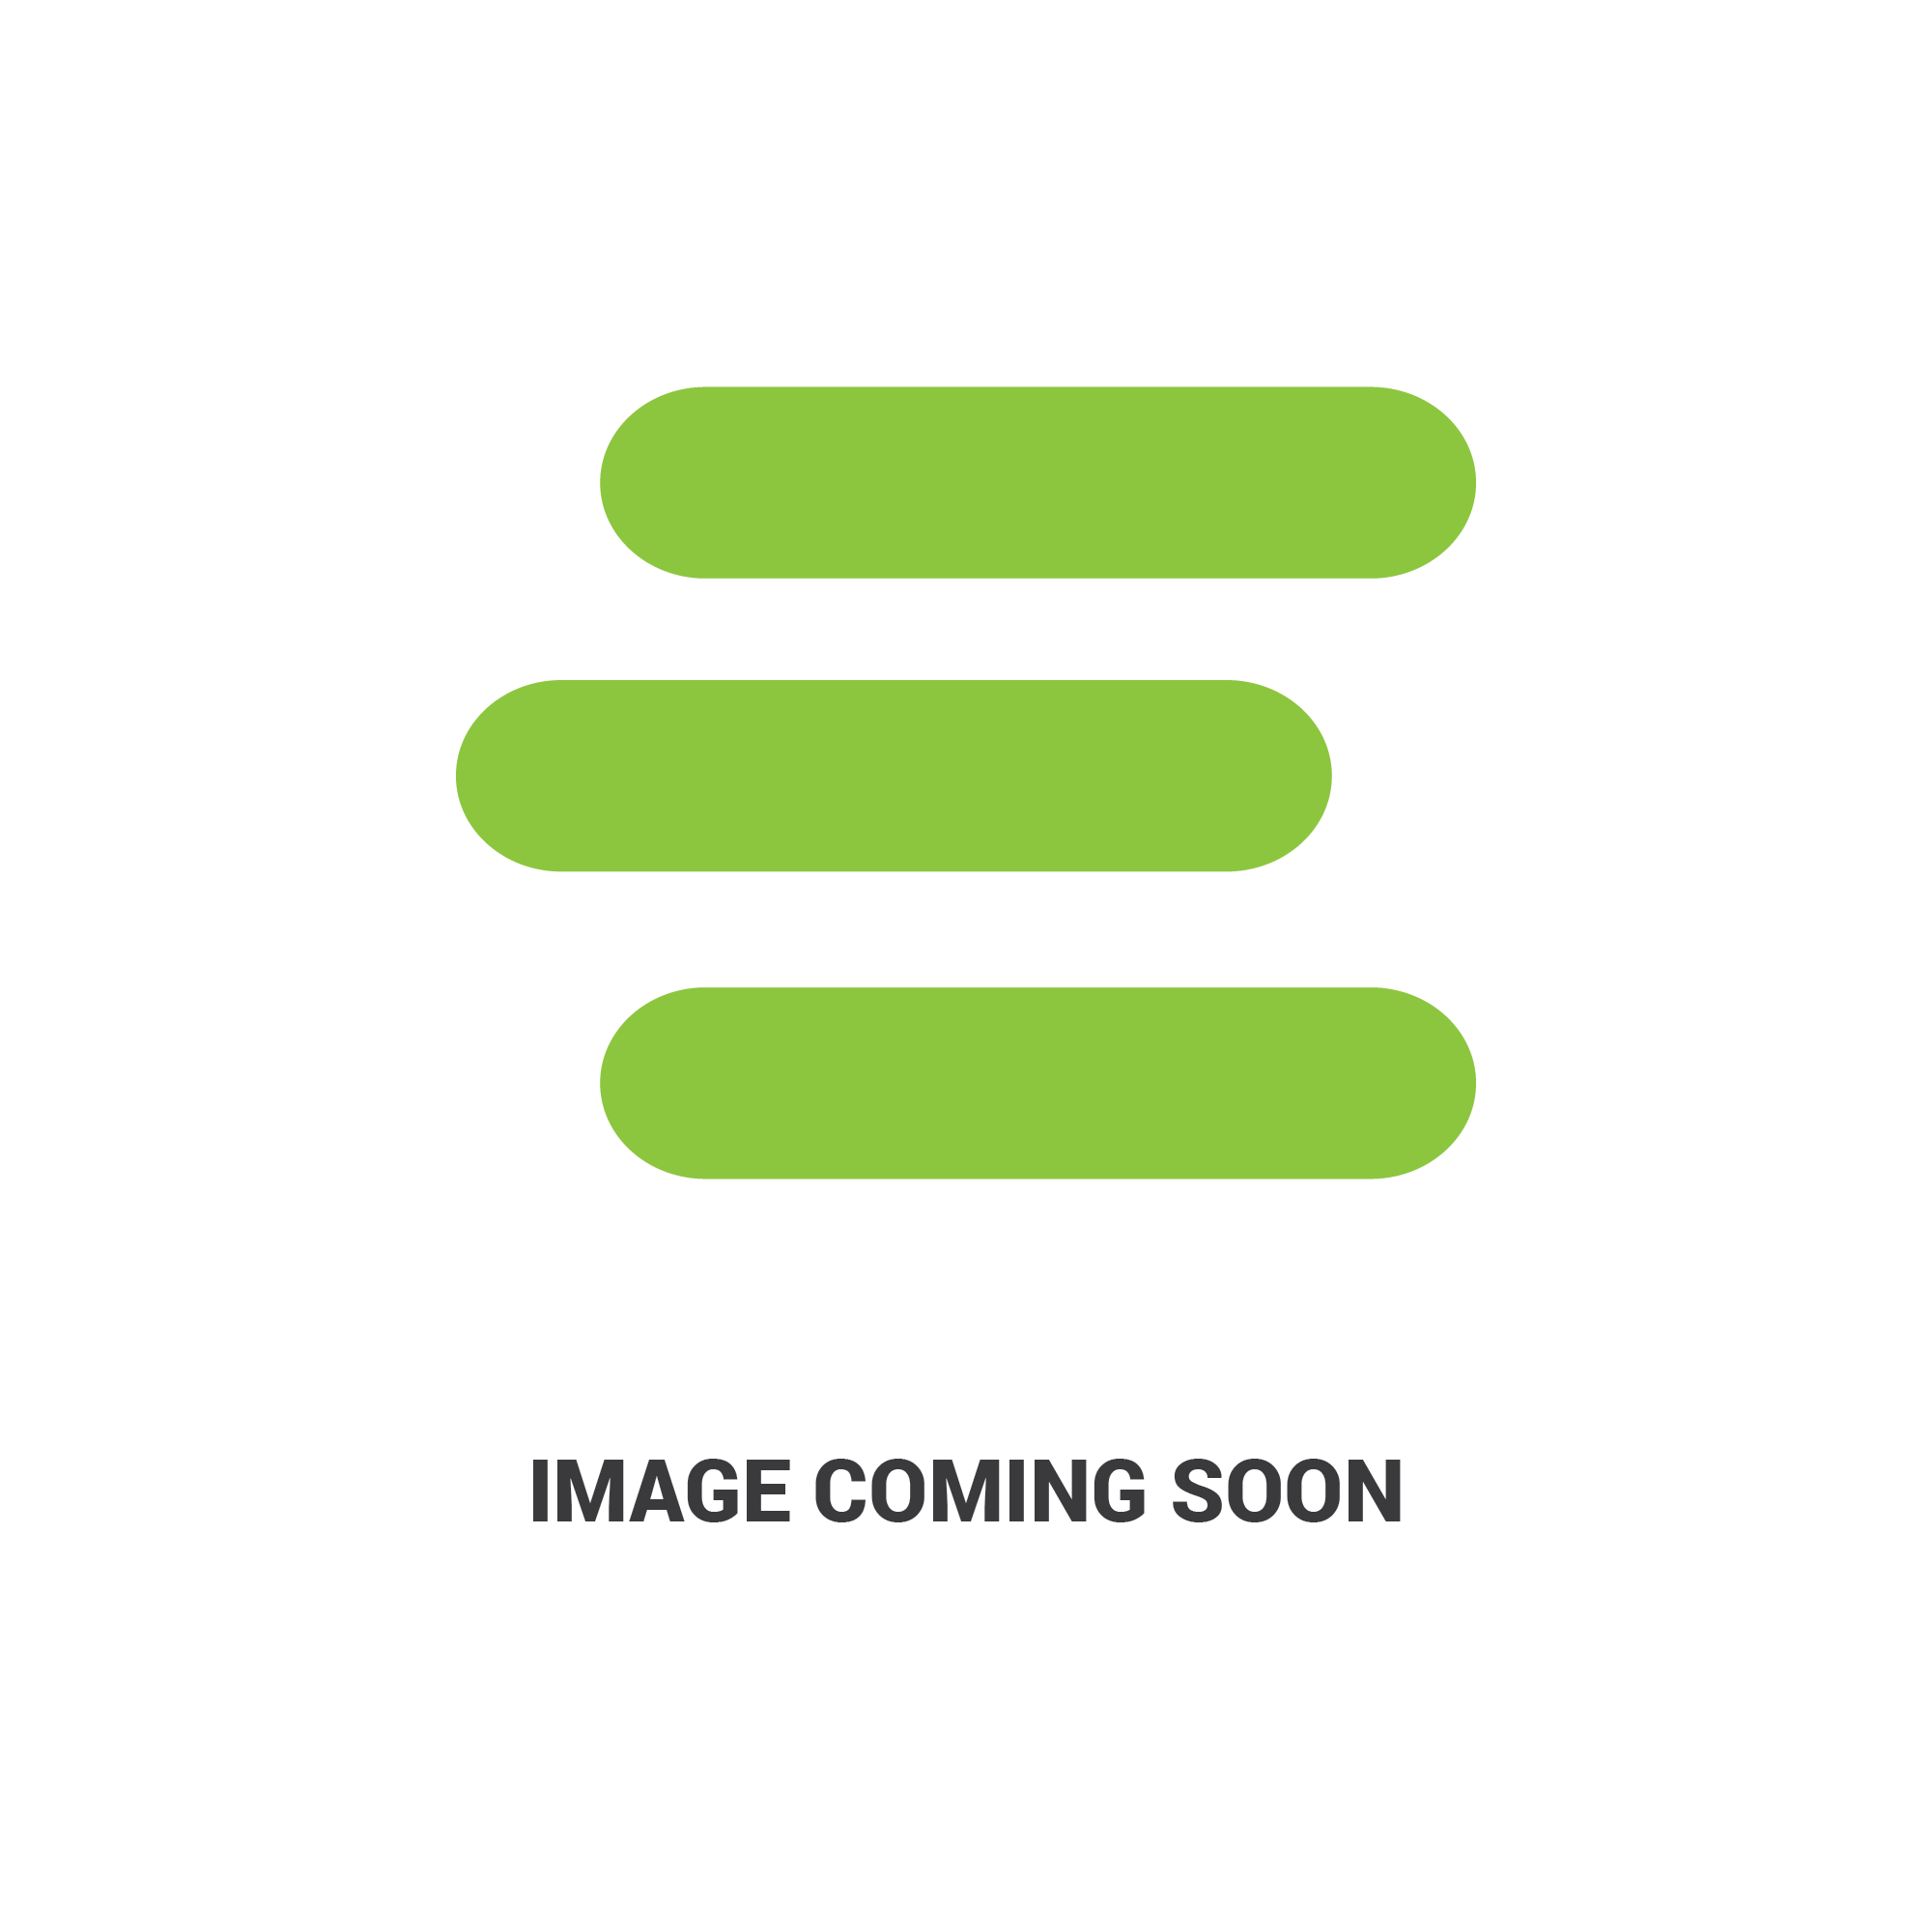 E-6675177edit 1.jpg